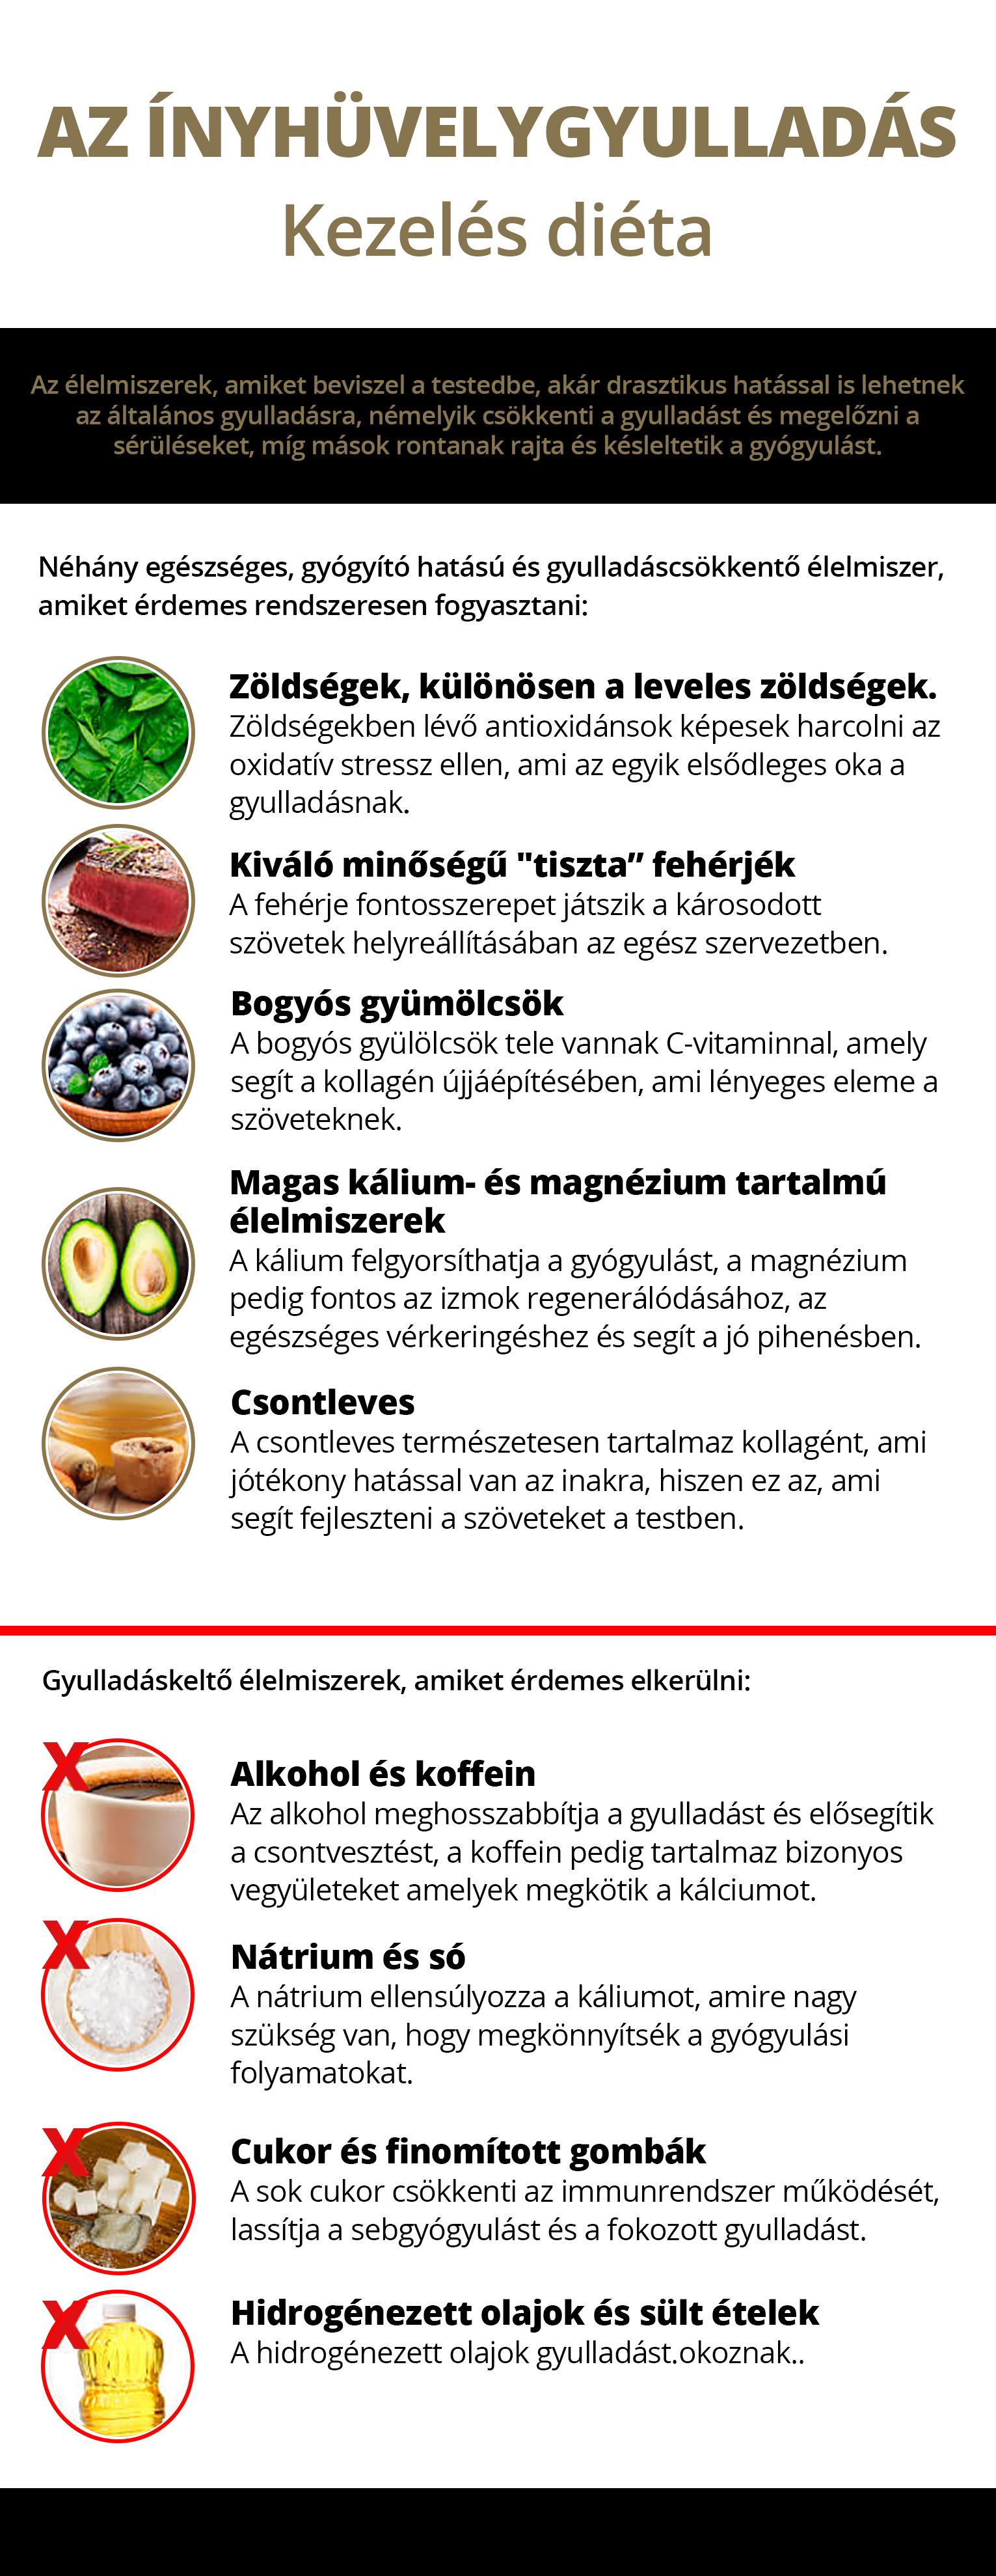 inhuvelygyulladas_dieta_kezeles